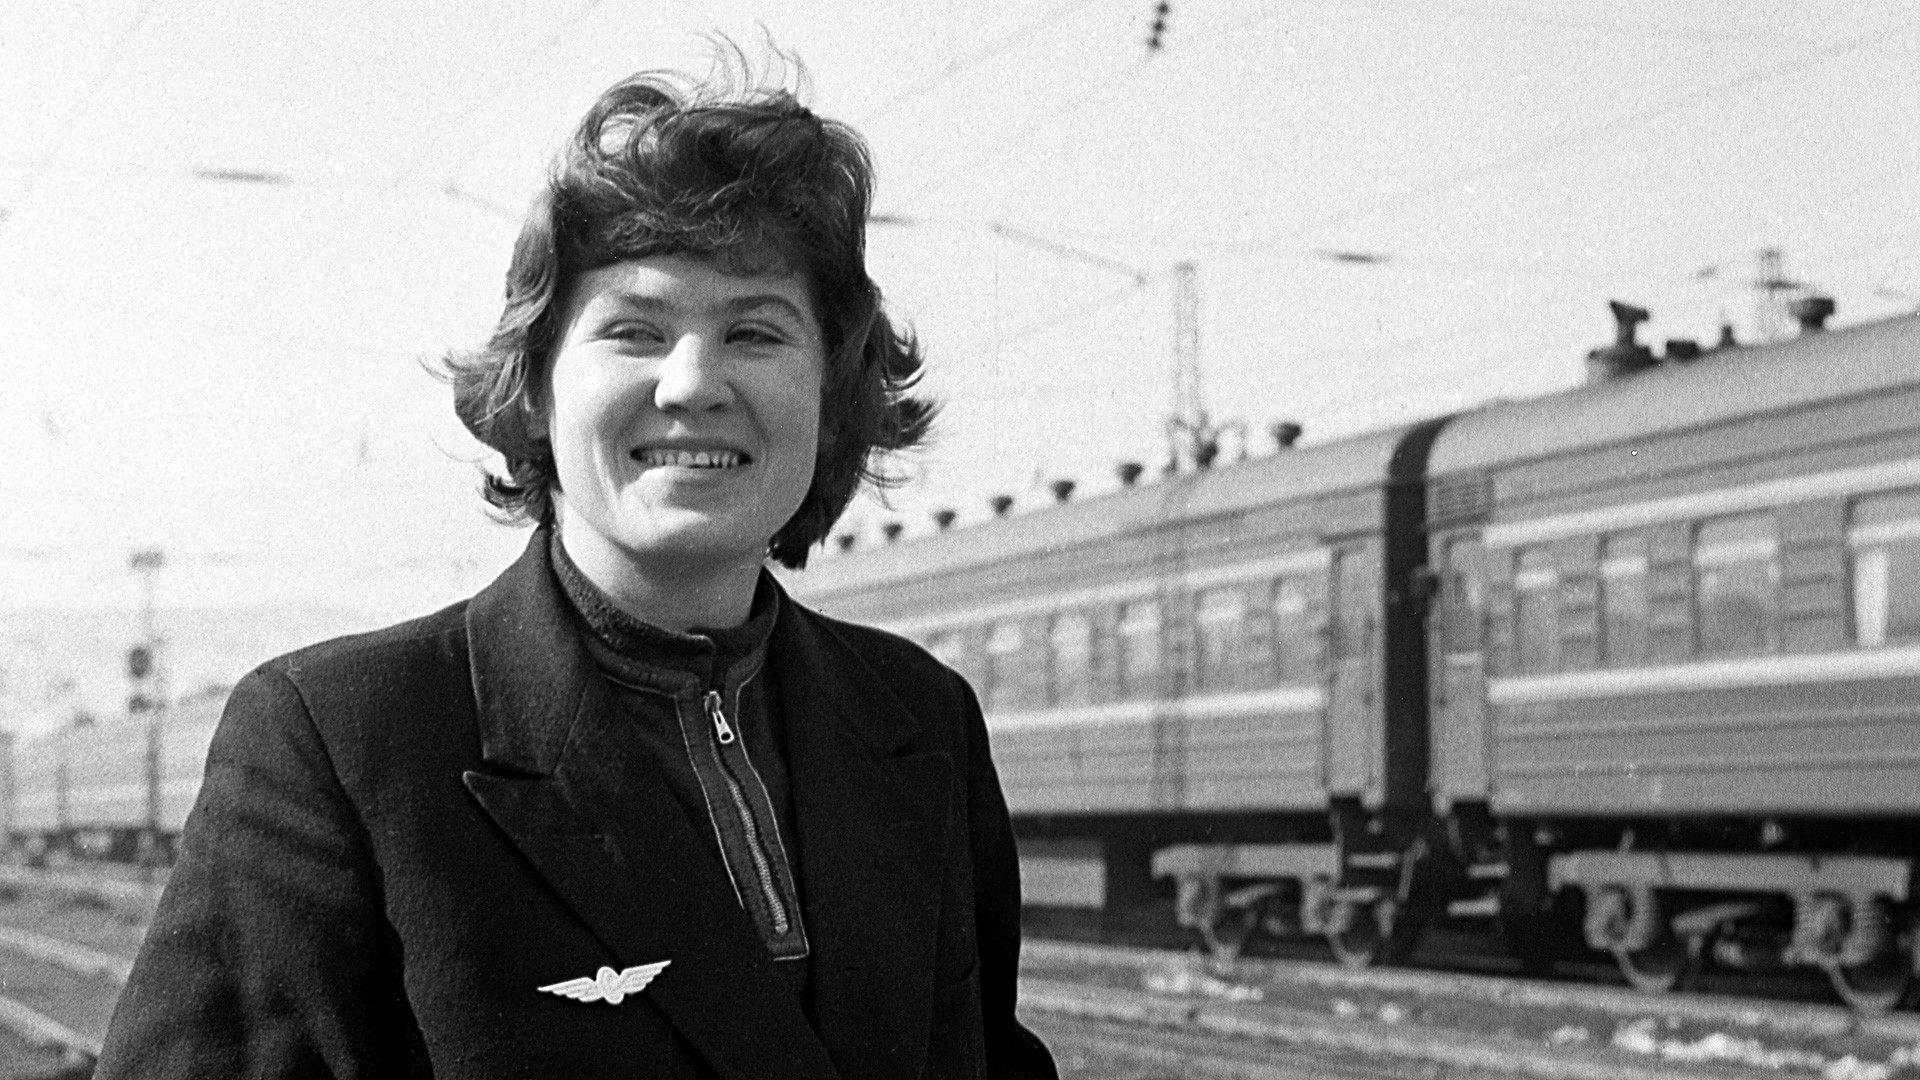 East Siberian Railway. Engine driver's assistant Tamara Petrik.